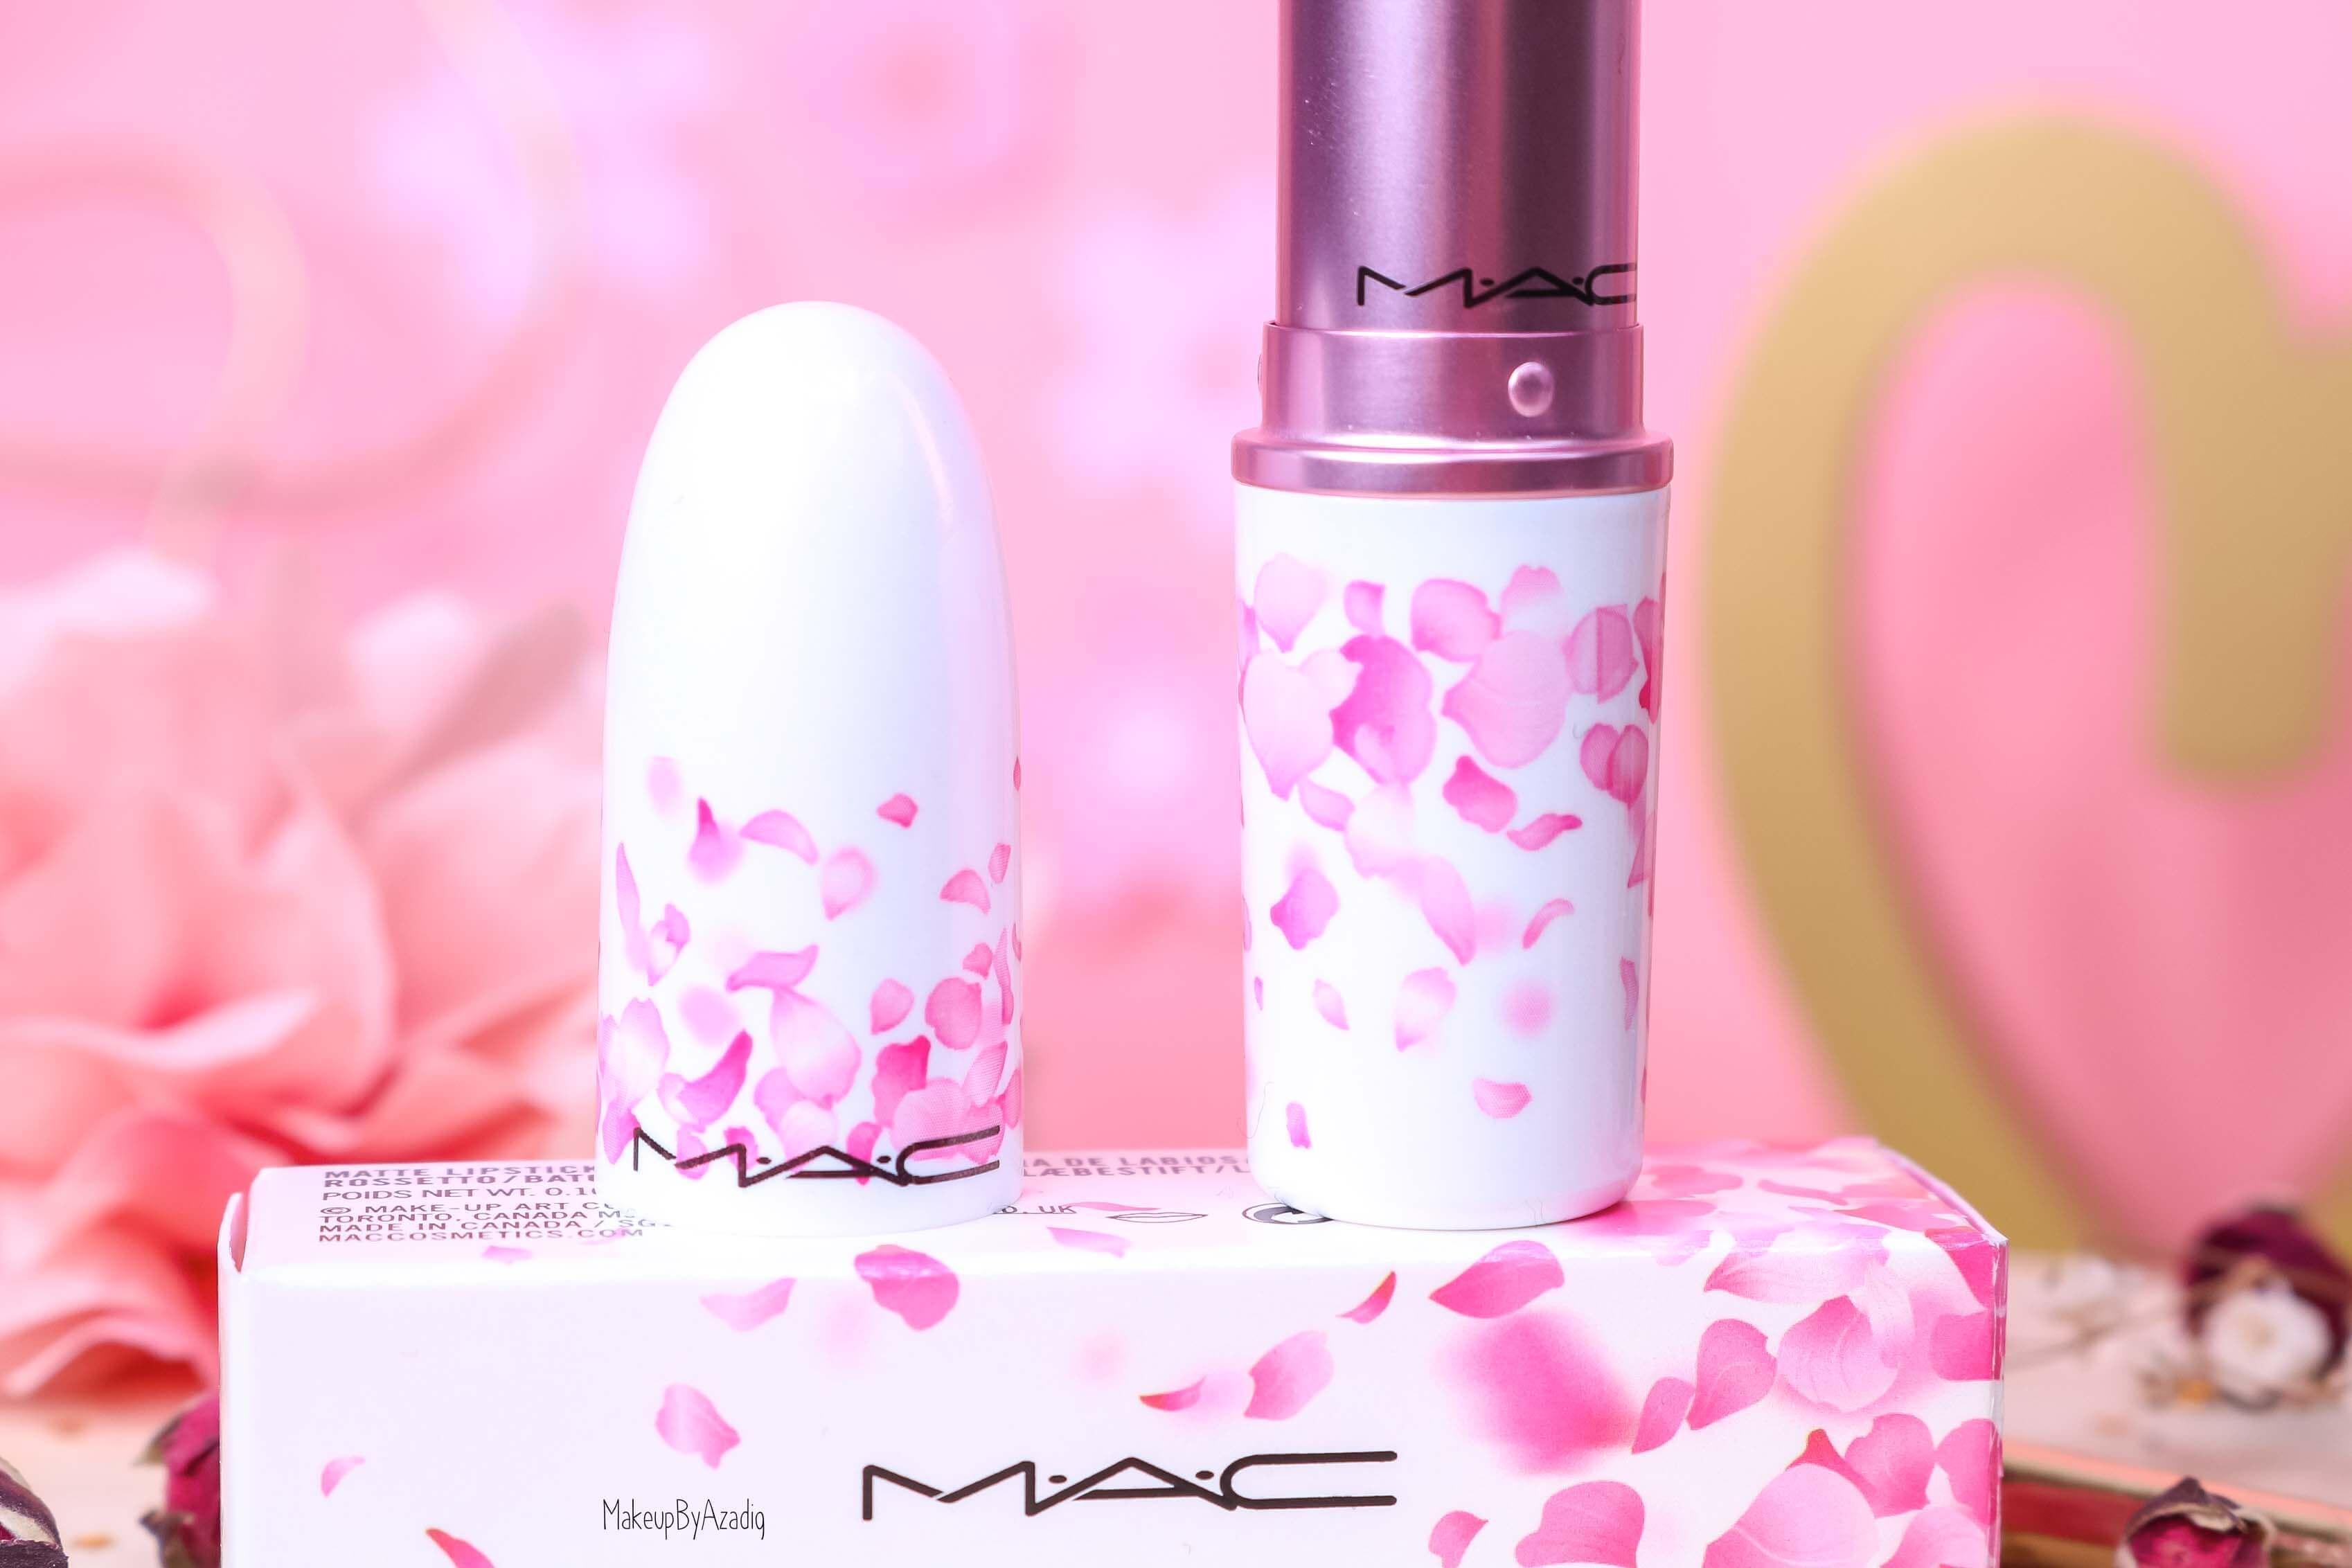 revue-rouge-a-levres-mac-cosmetics-collection-boom-boom-bloom-printemps-makeupbyazadig-avis-swatch-prix-france-cerisier